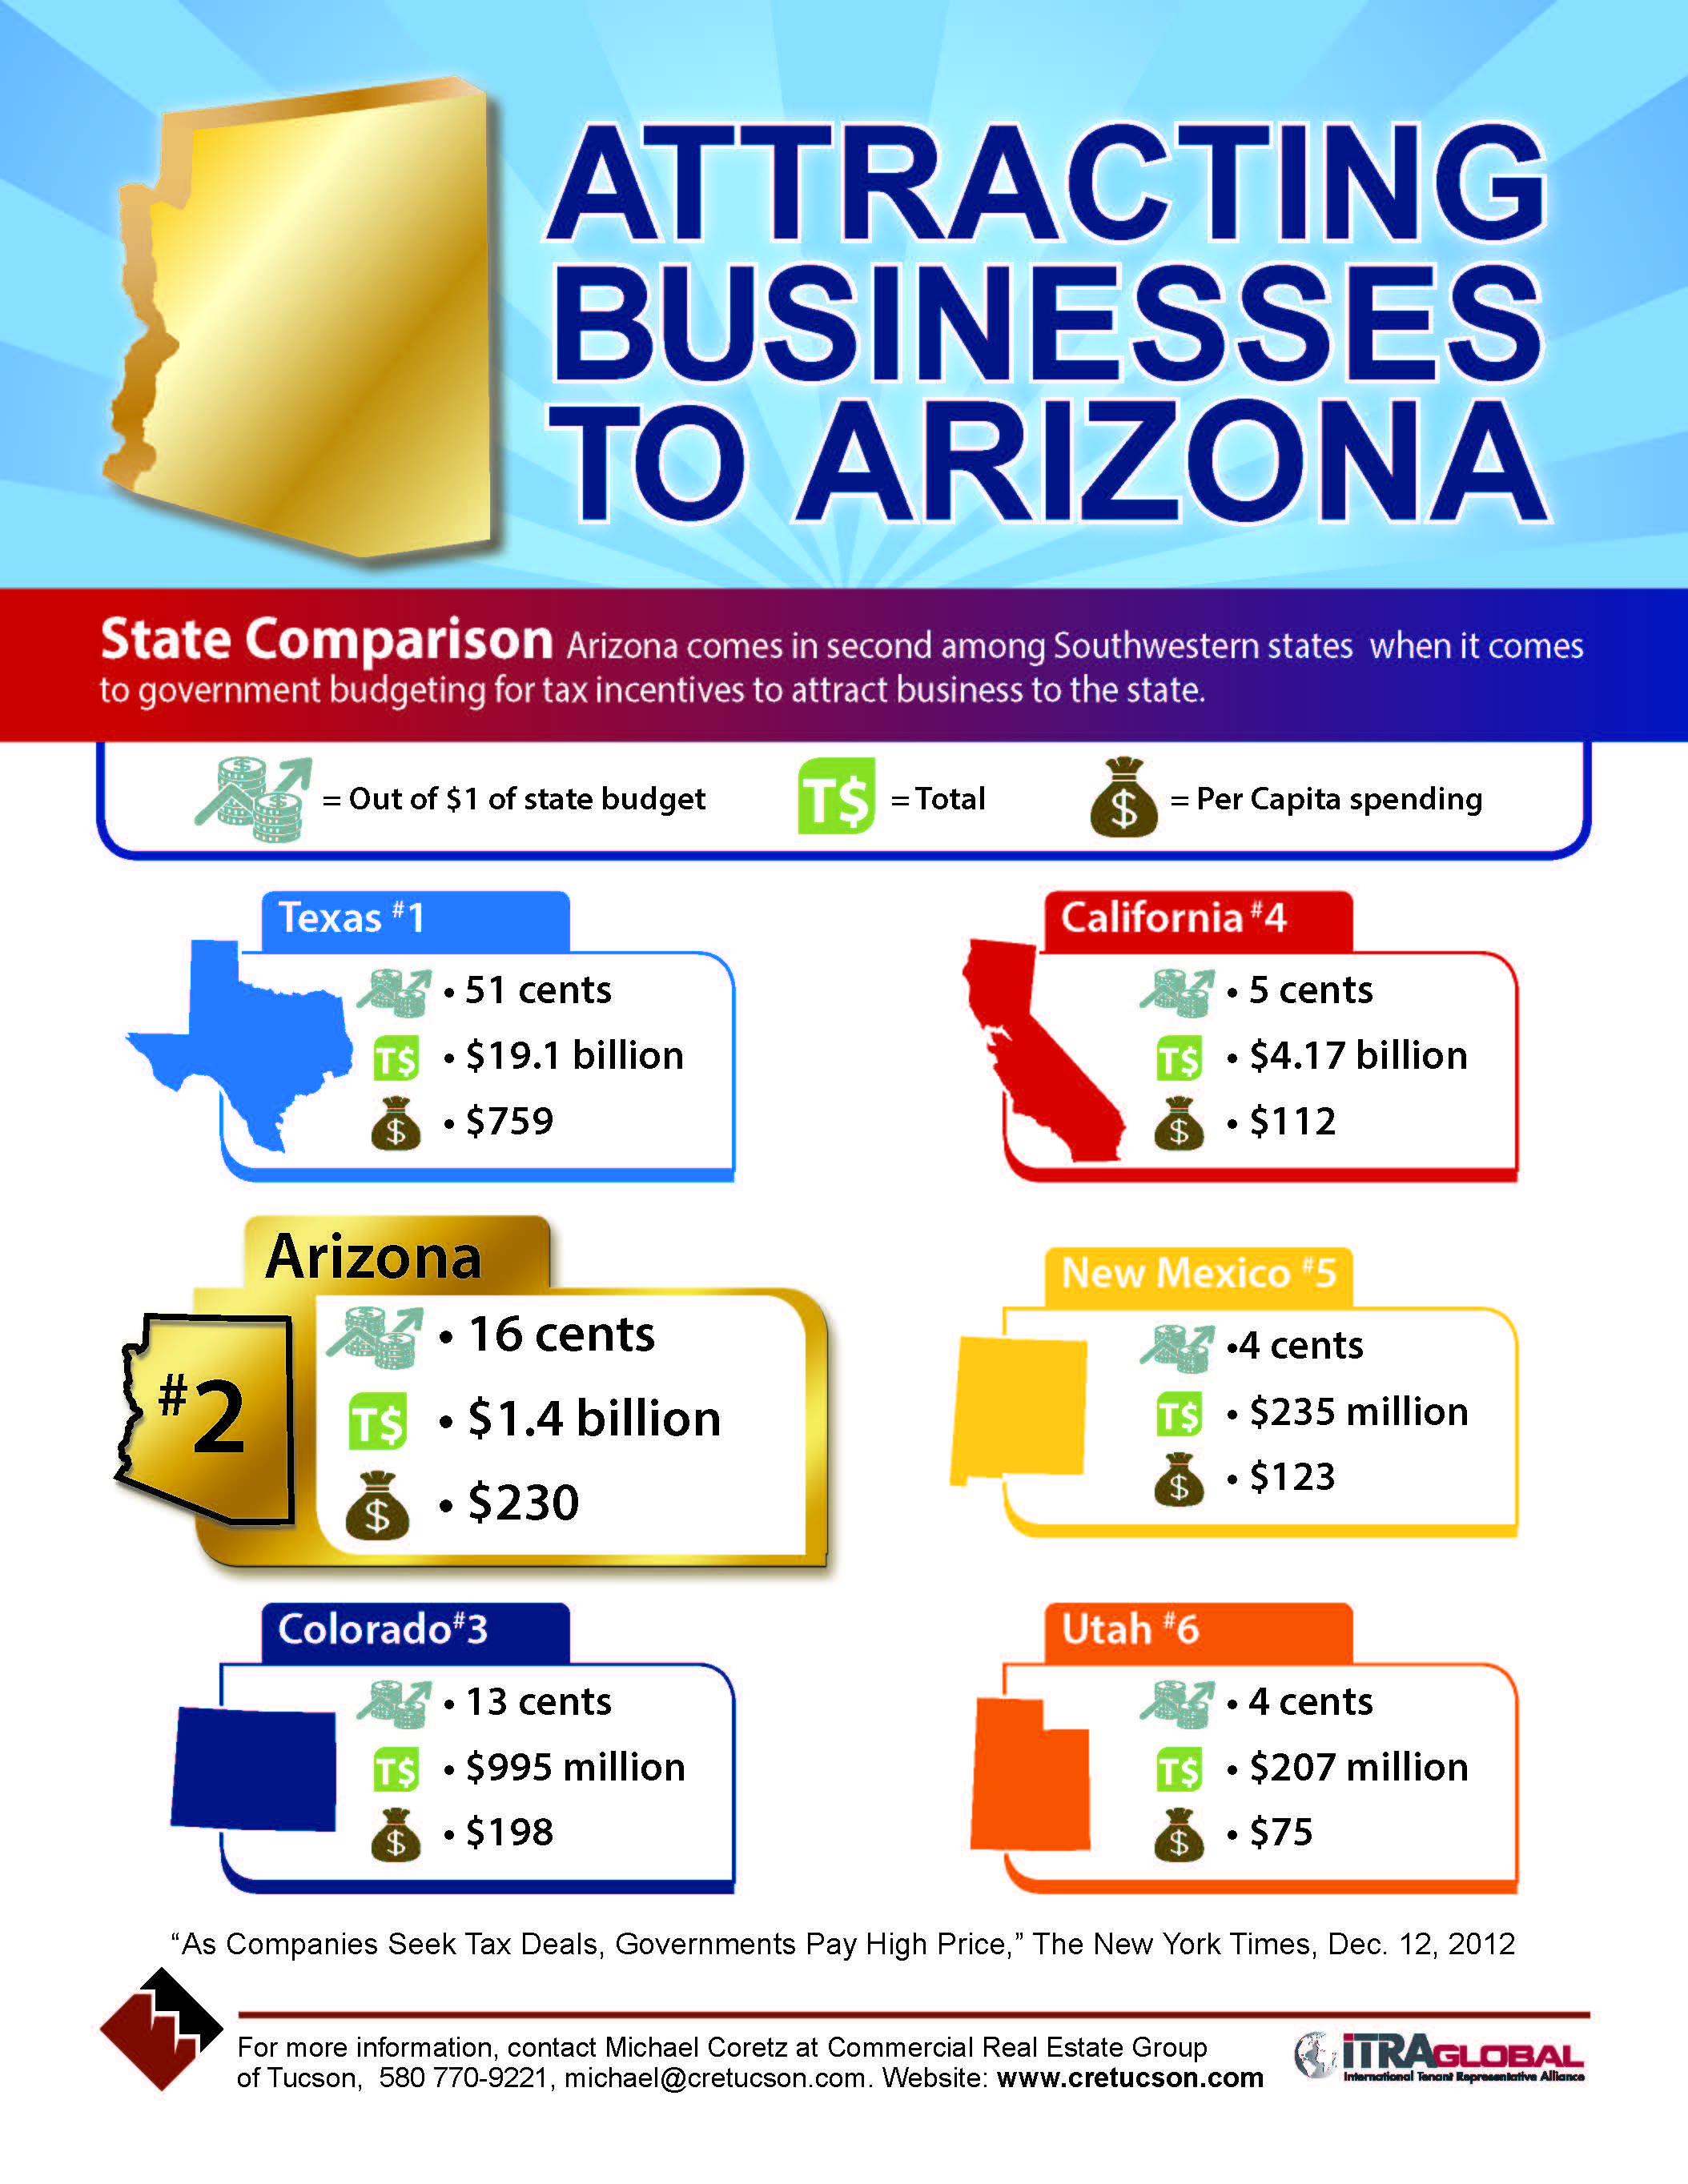 2013 Attracting Business to Arizona State Comparison Inforgraphic (Img)